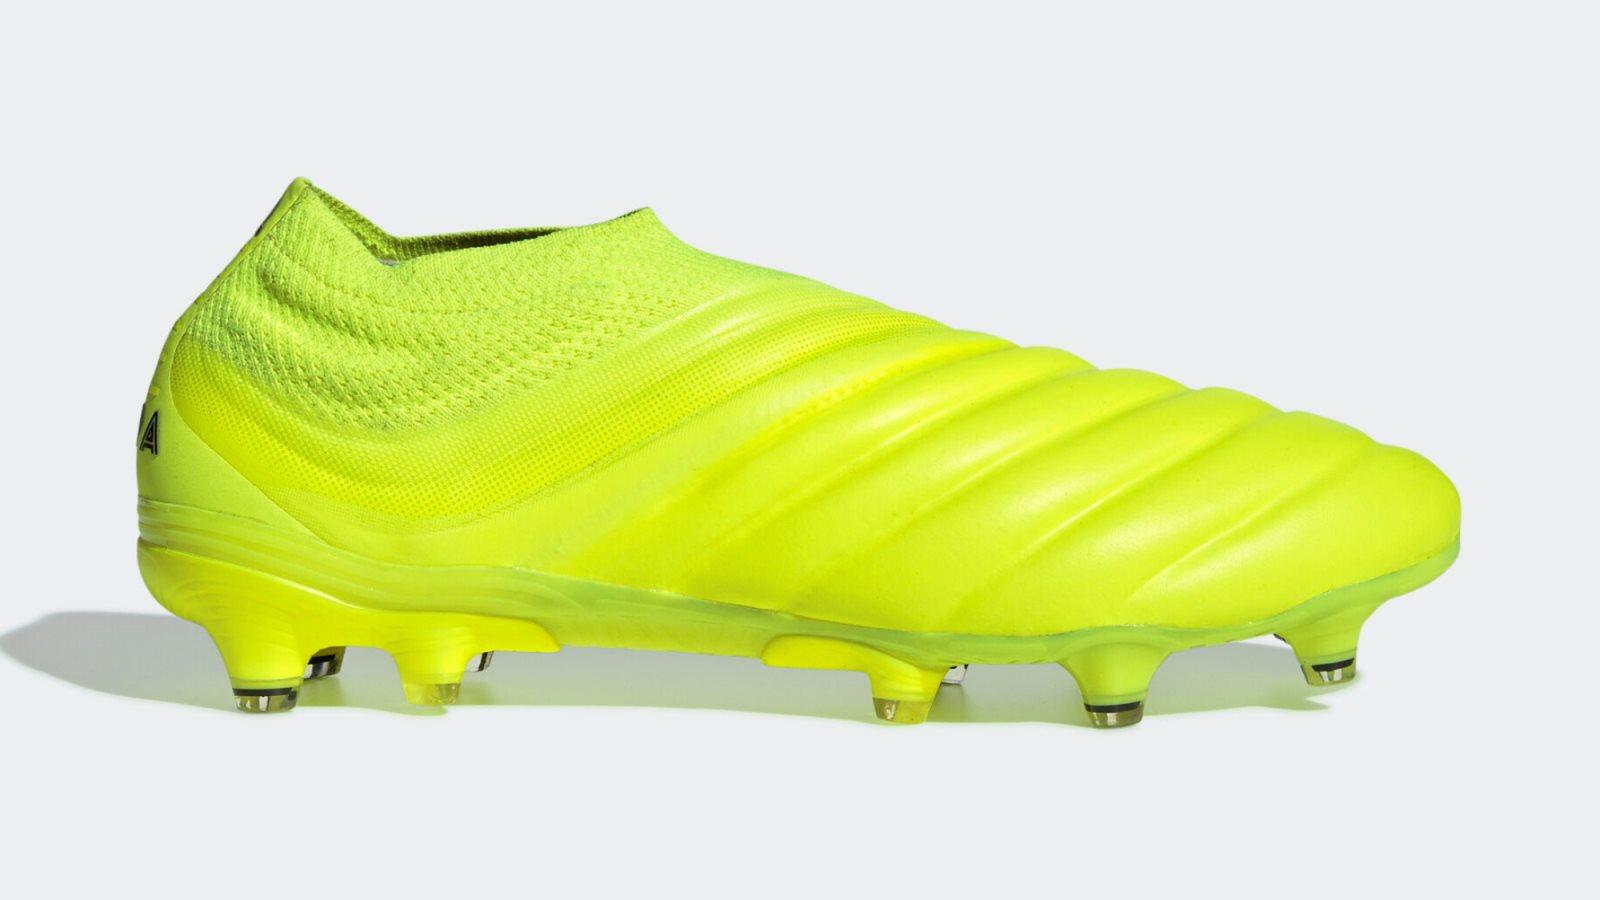 51abce850 Paulo Dybala Football Boots